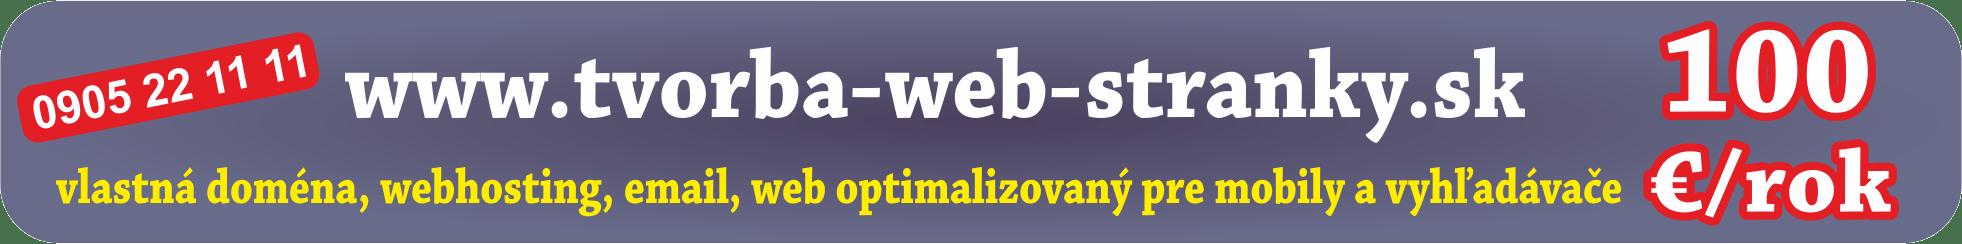 tworba web stranky